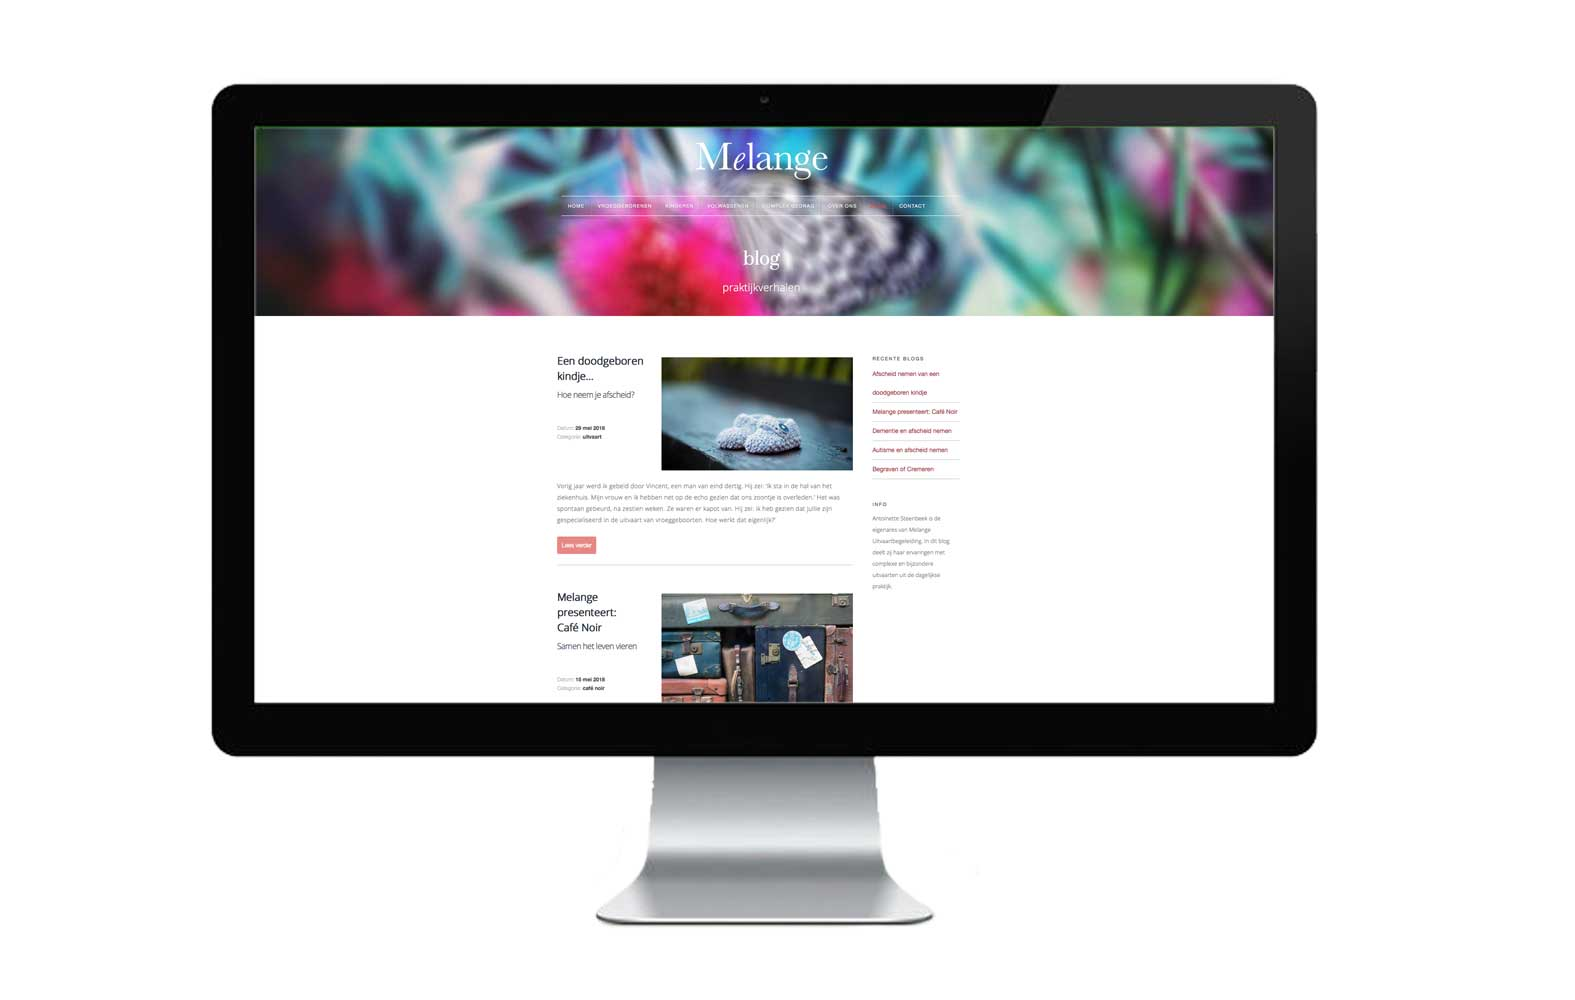 StudioErnst-Melange-Uitvaart-Uitvaart-Blog